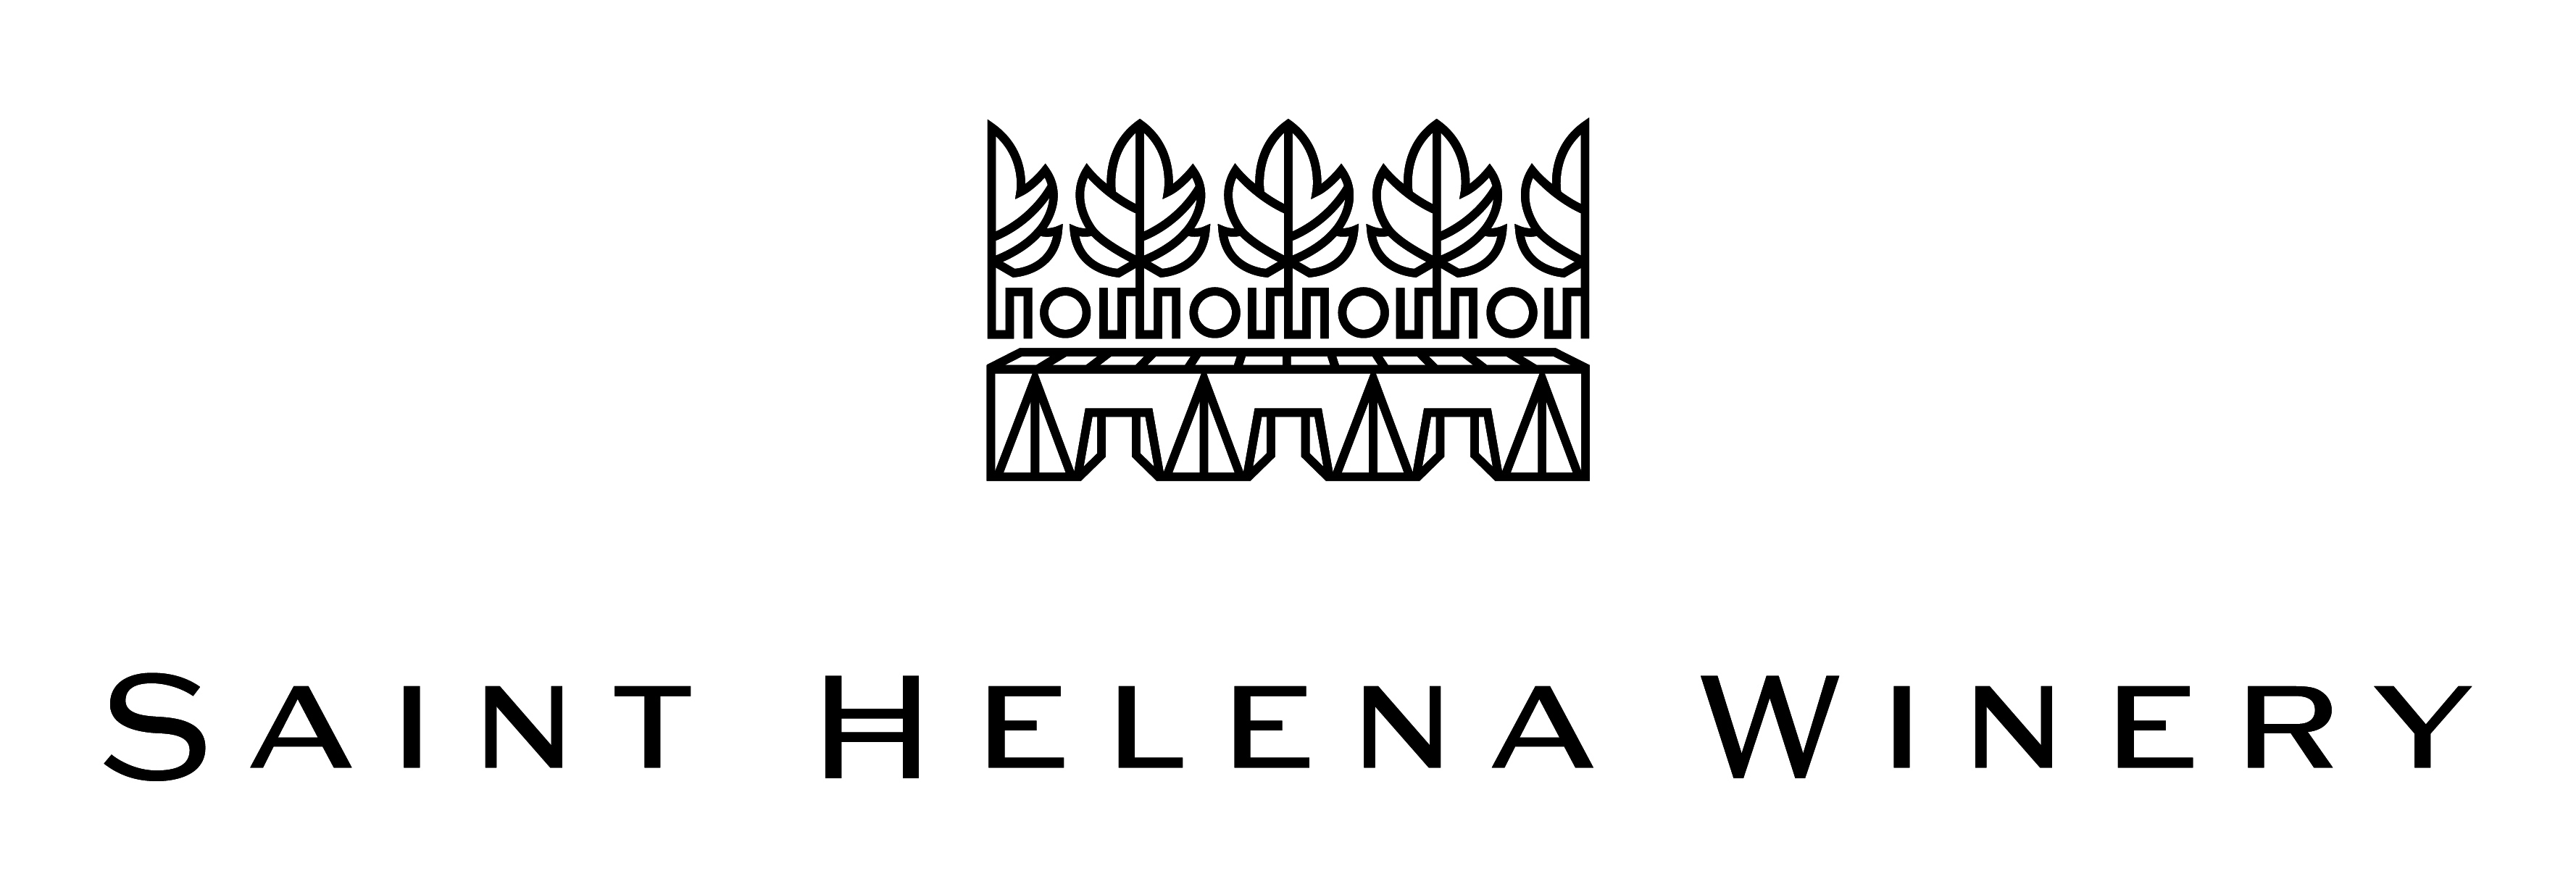 Saint Helena logo